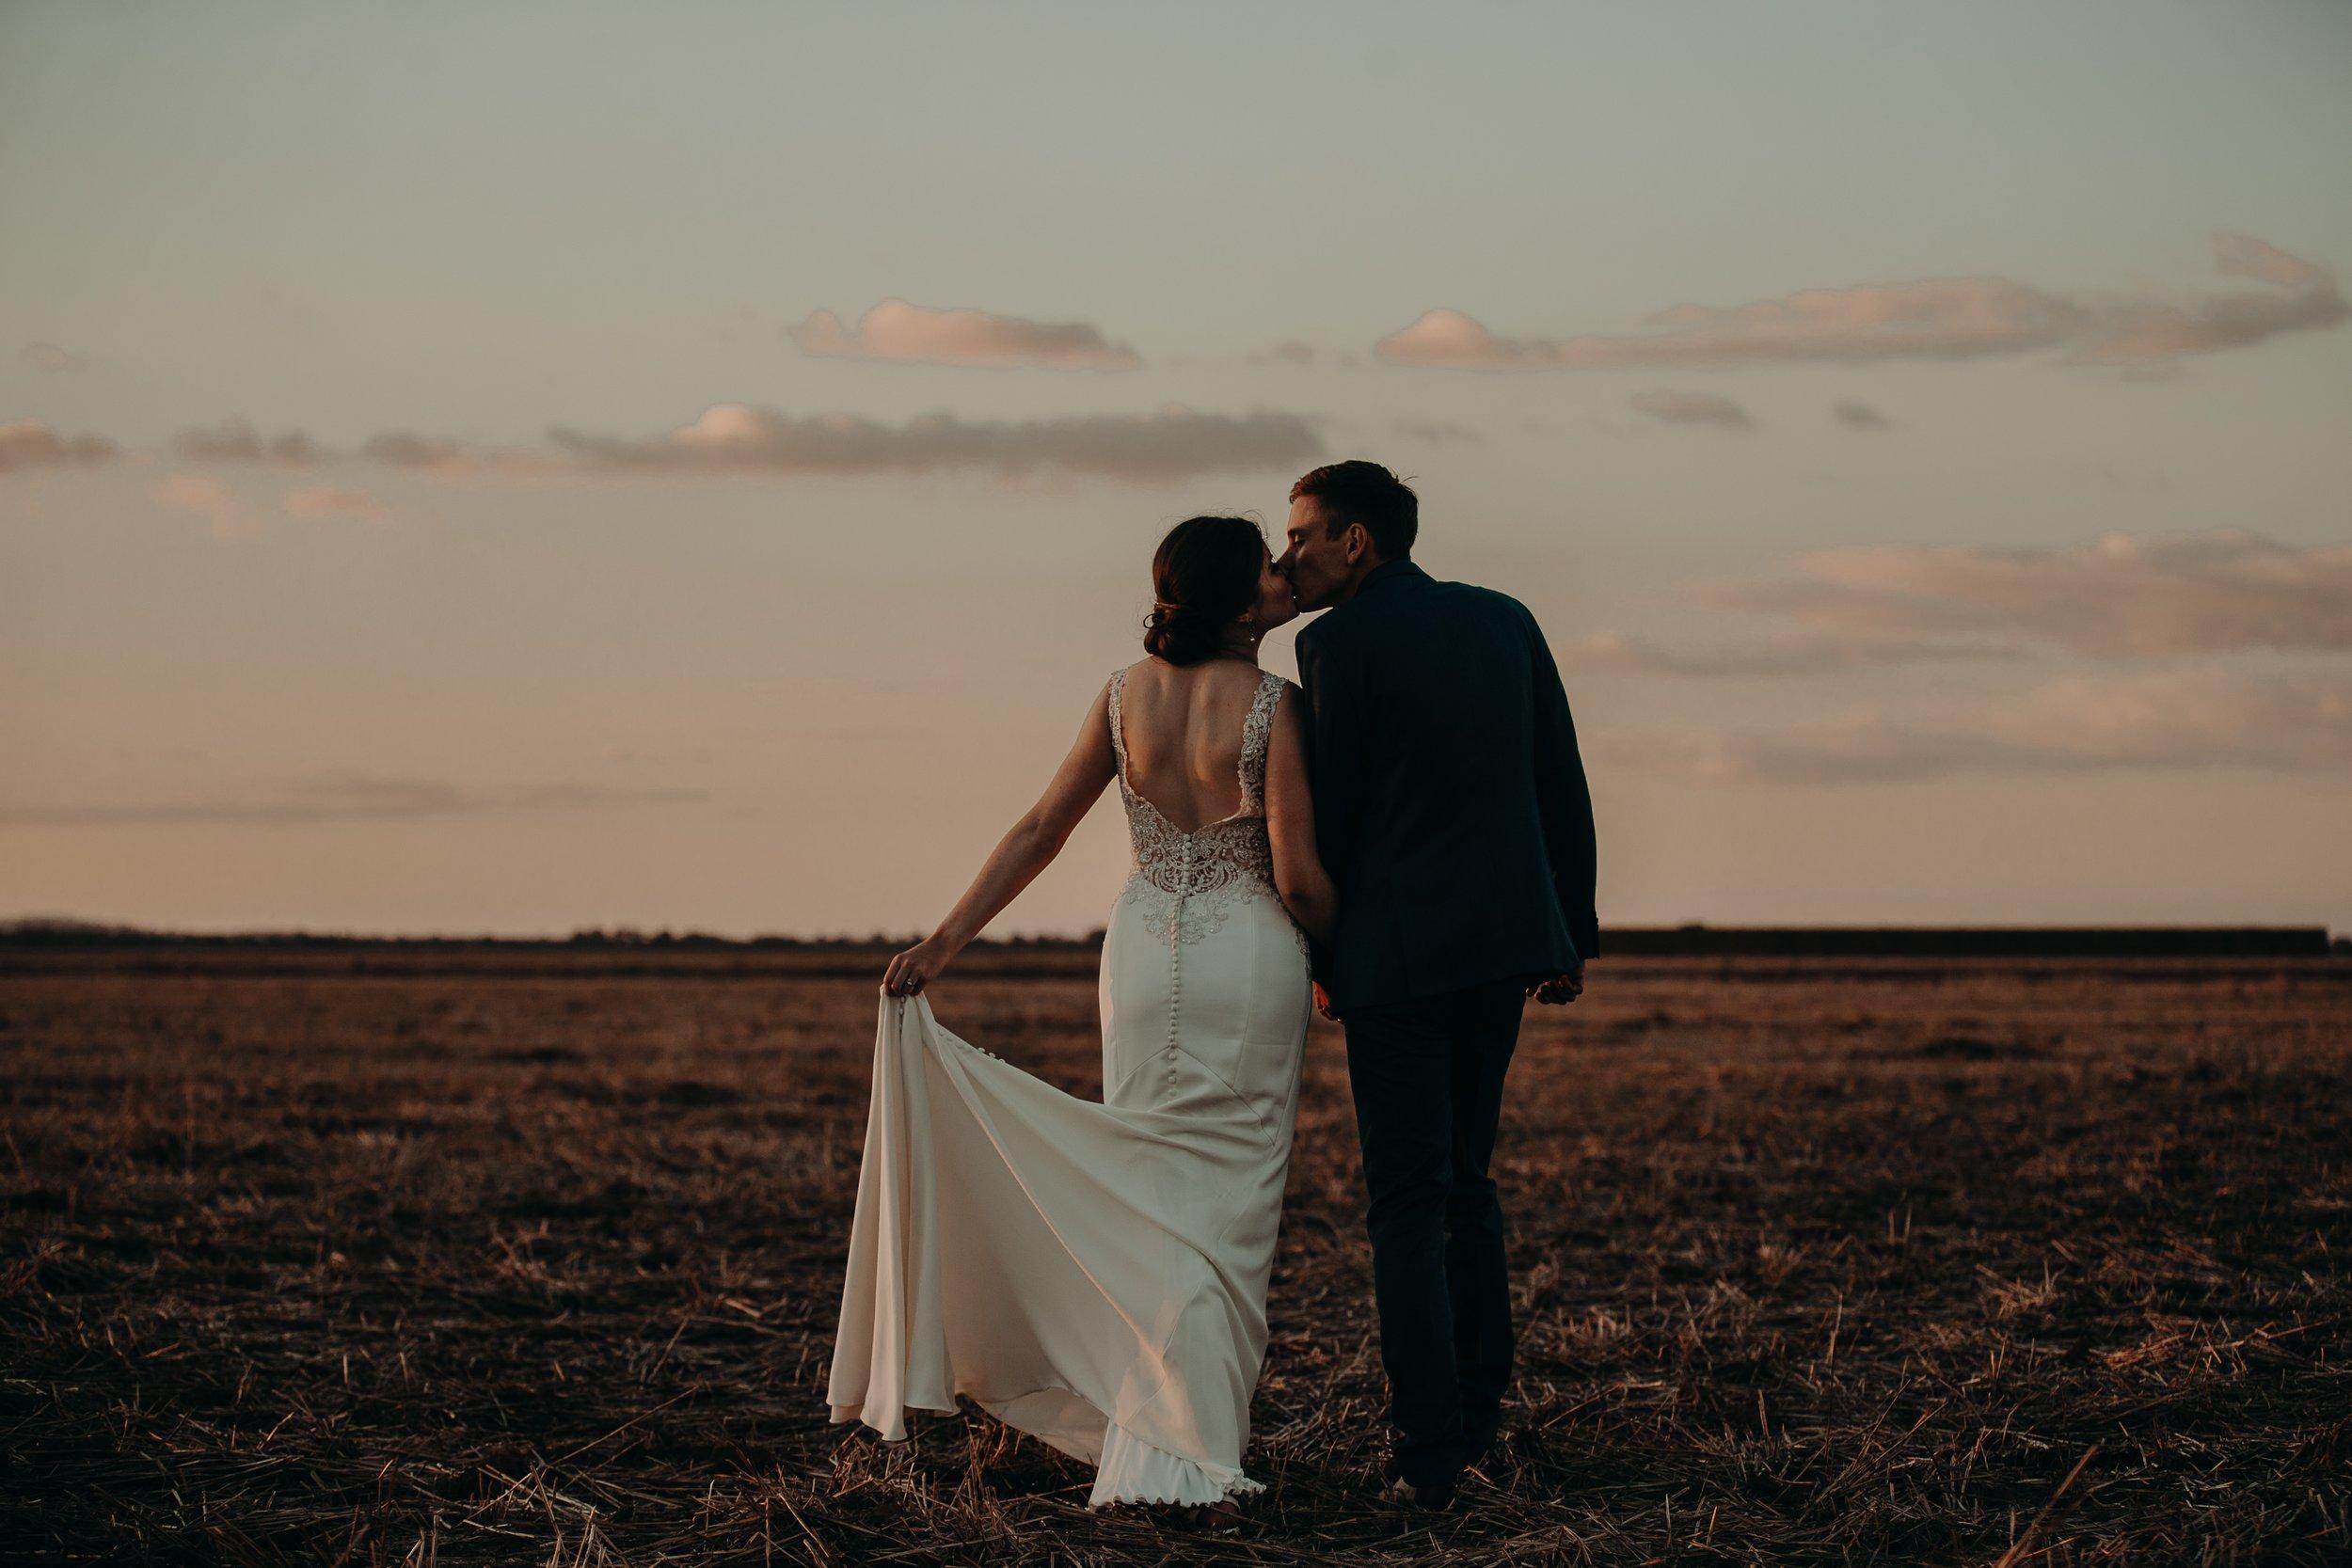 mickalathomas_puremacphotography_weddingphotographer_couplephotographer_Sheppartonphotographer_2572.jpg